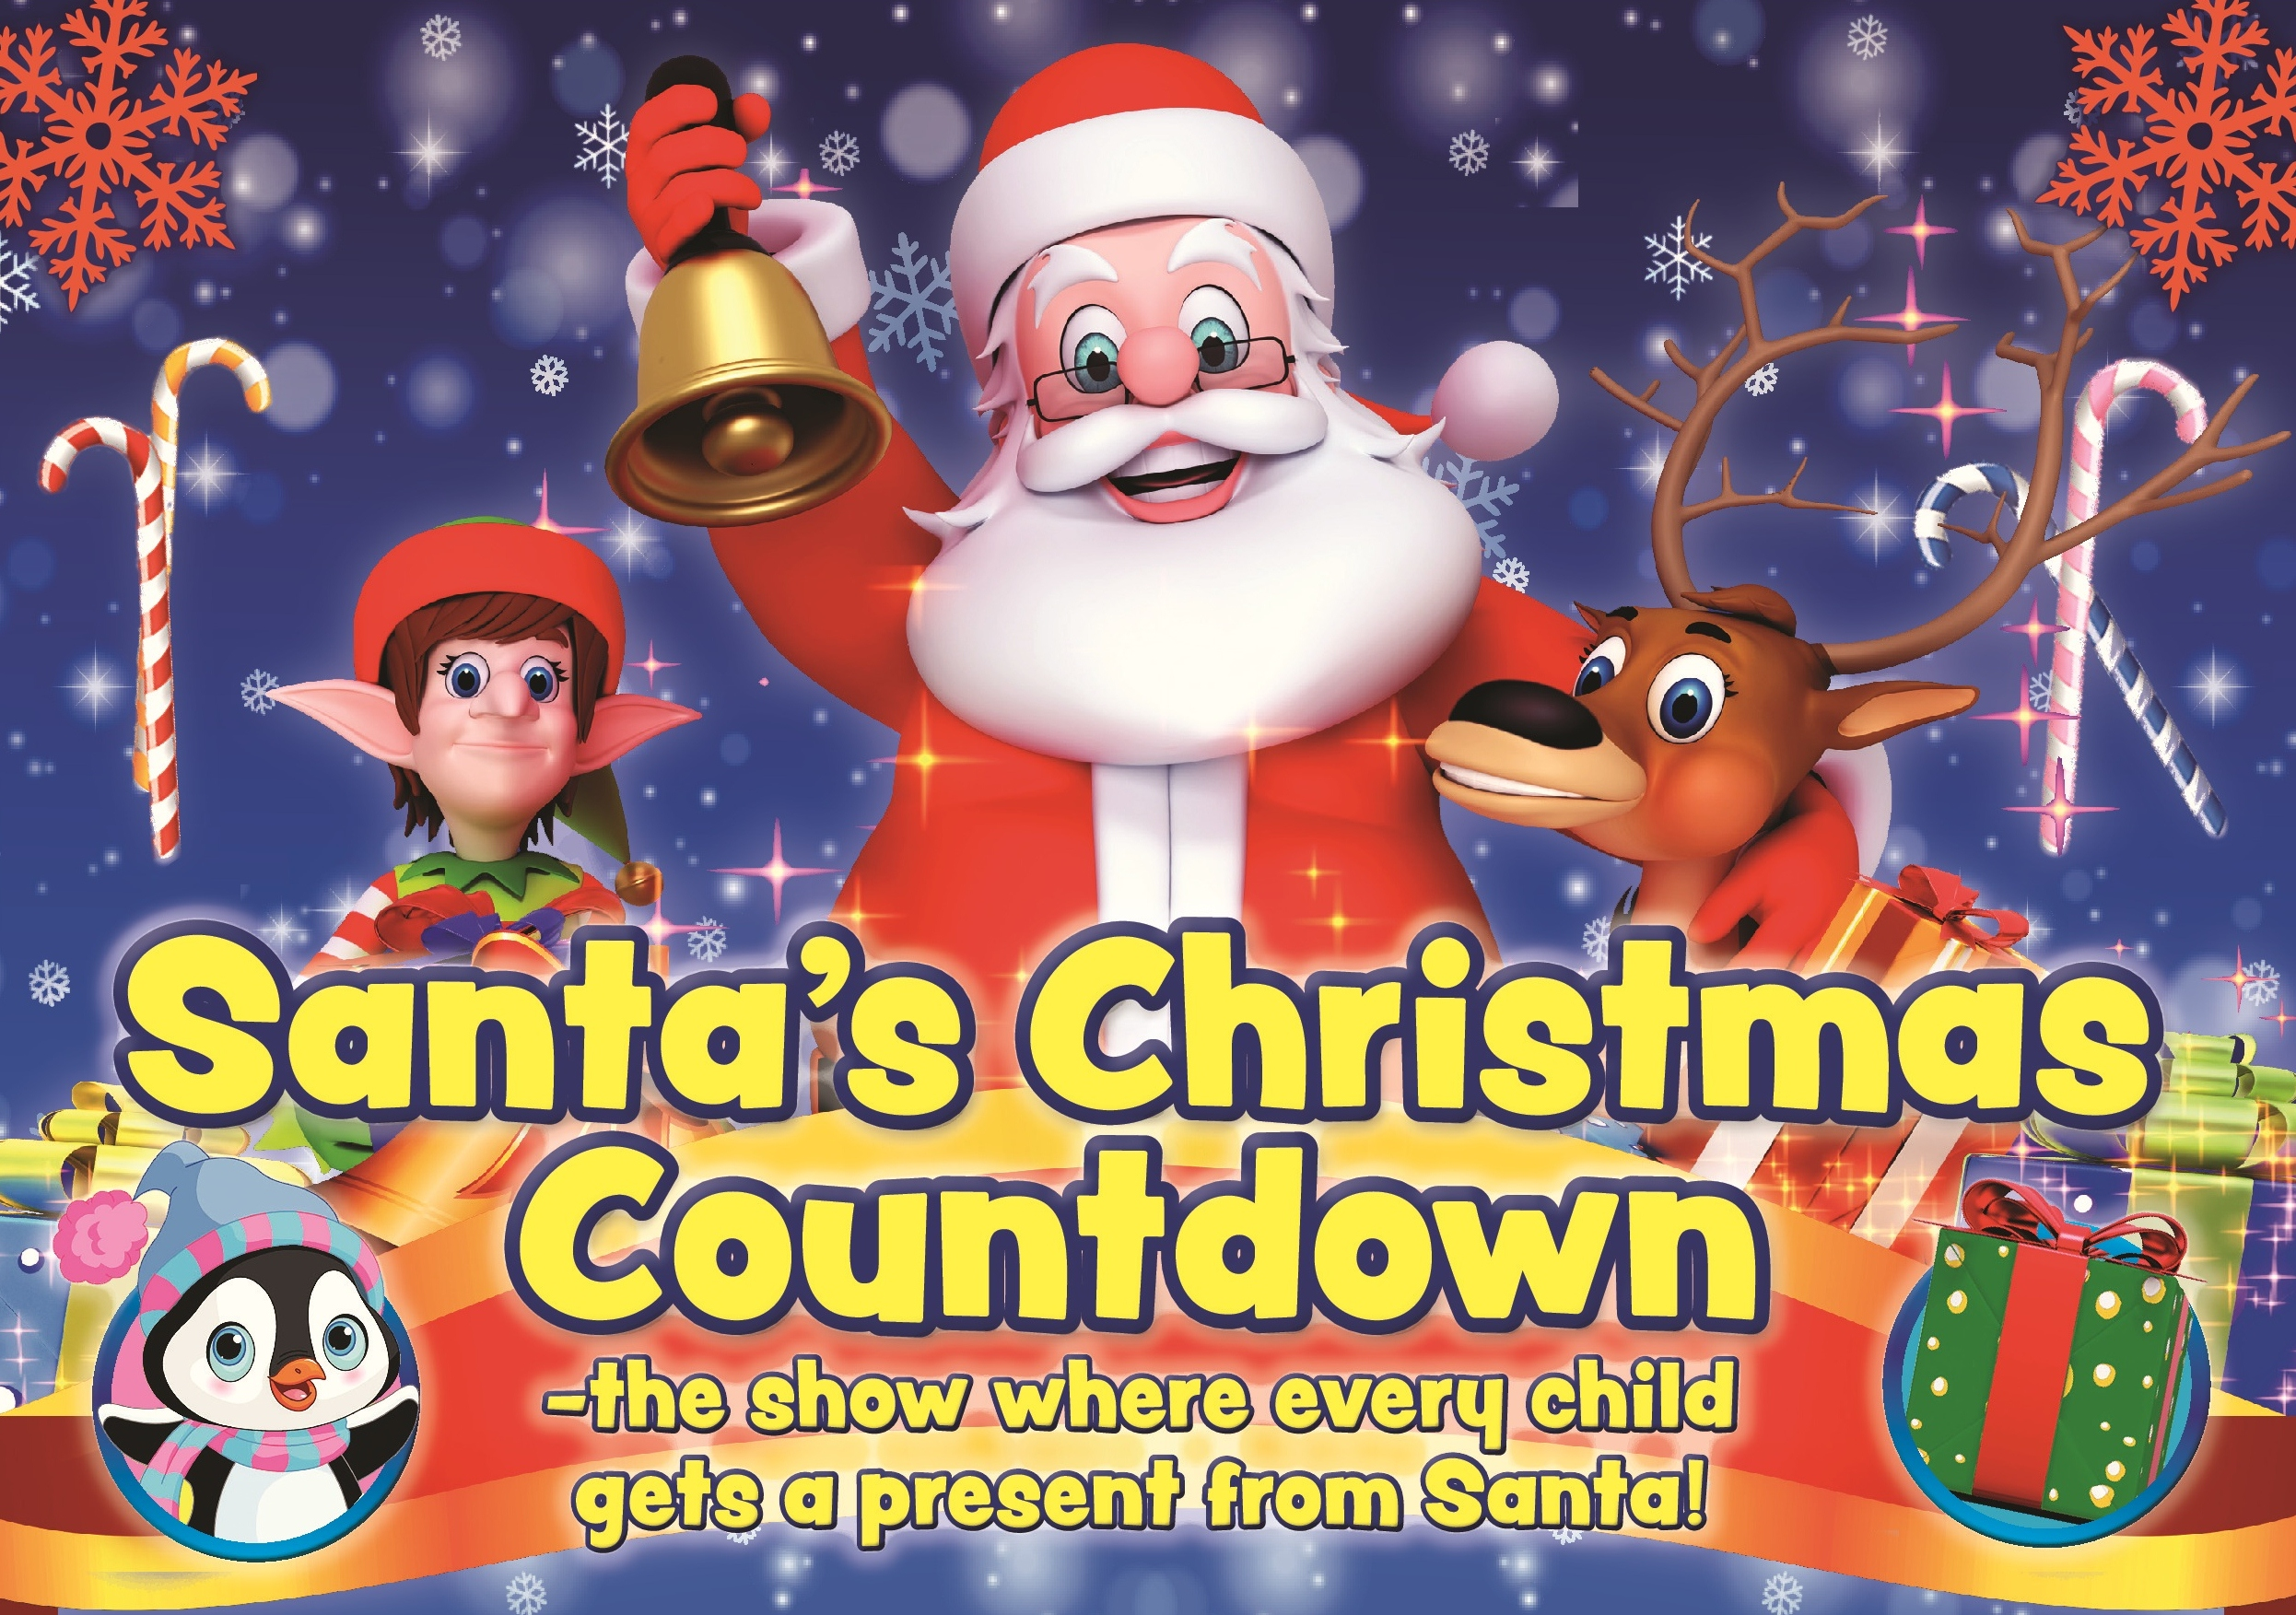 Santa's Christmas Countdown landscape A5.jpg